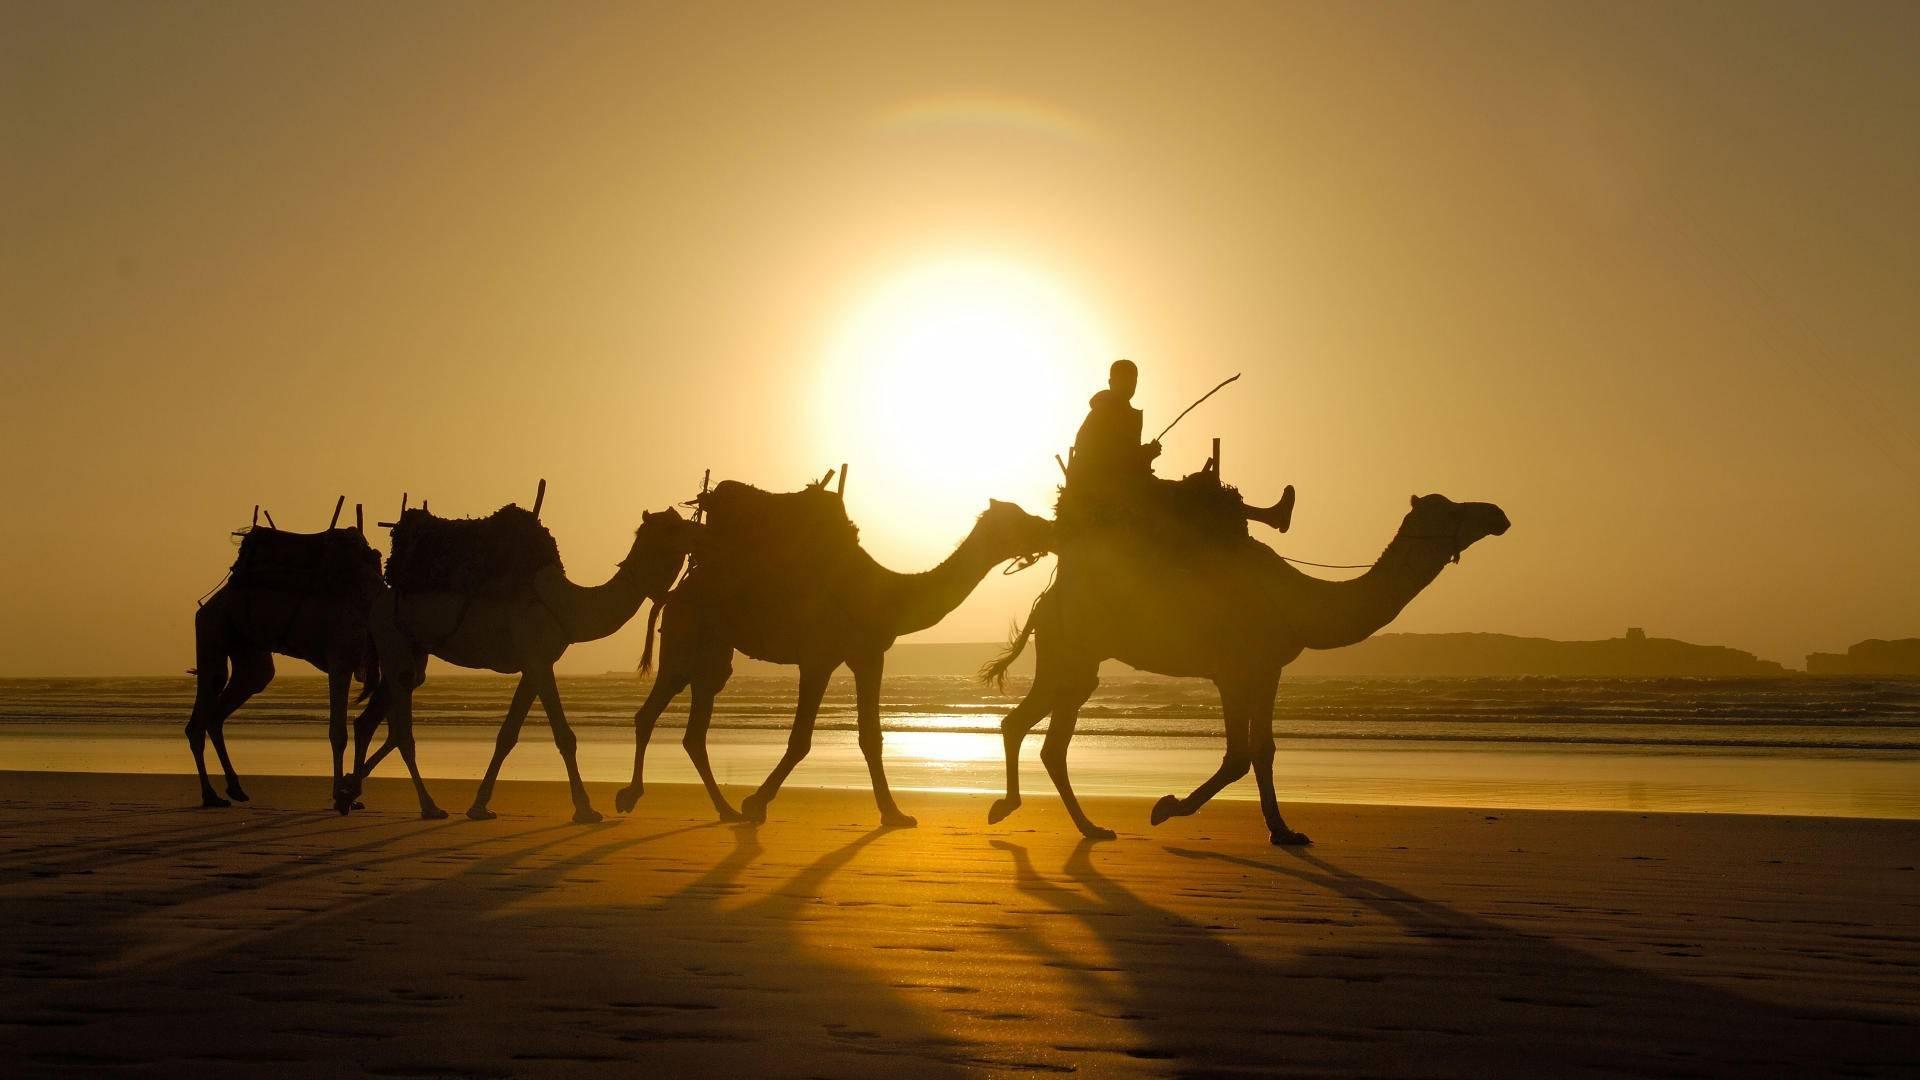 Camel Backgrounds